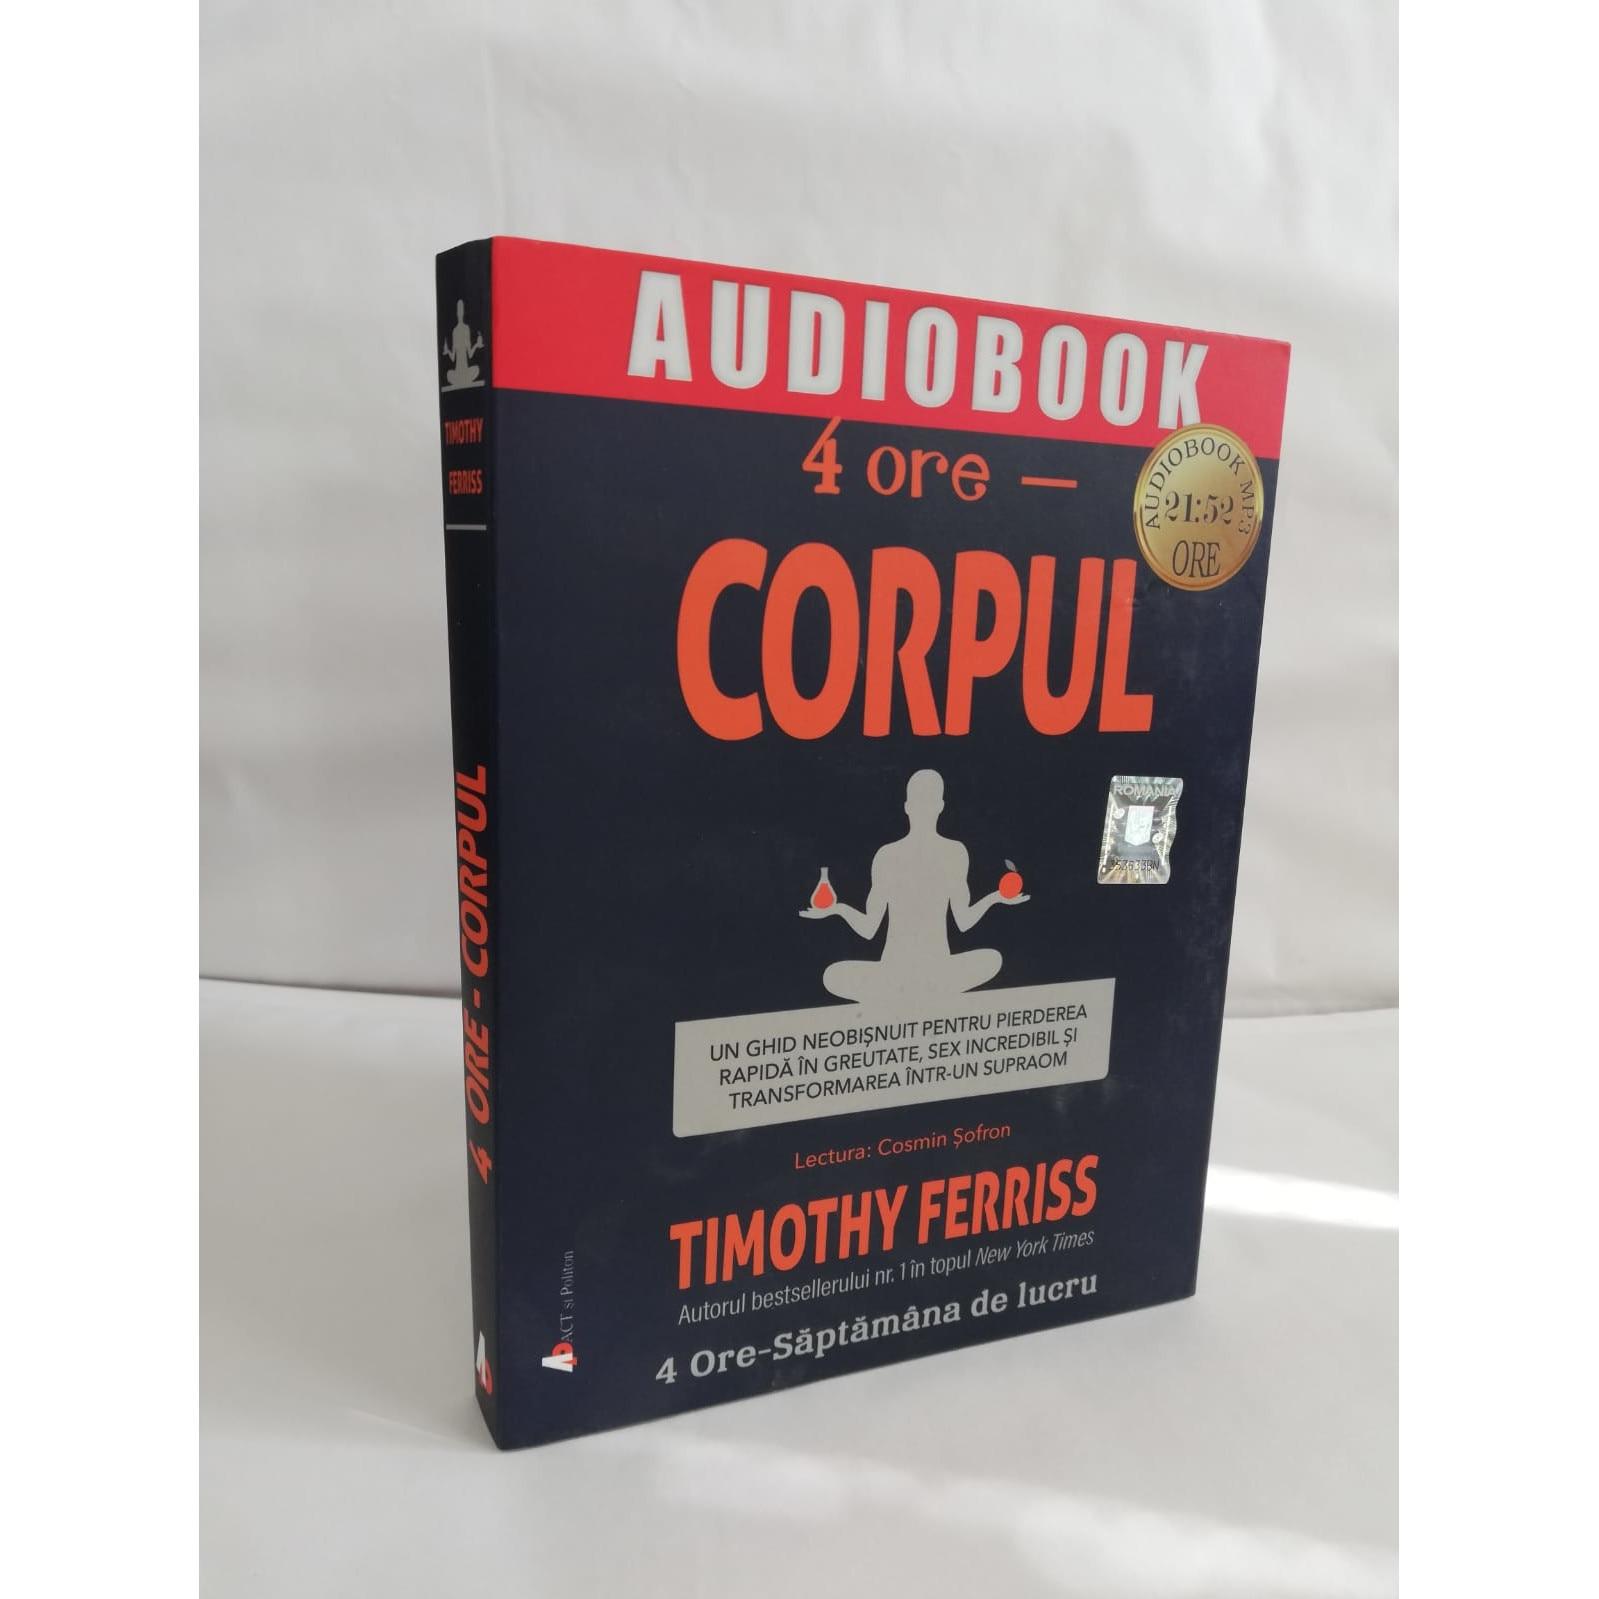 te pot face sa slabesti audiobook